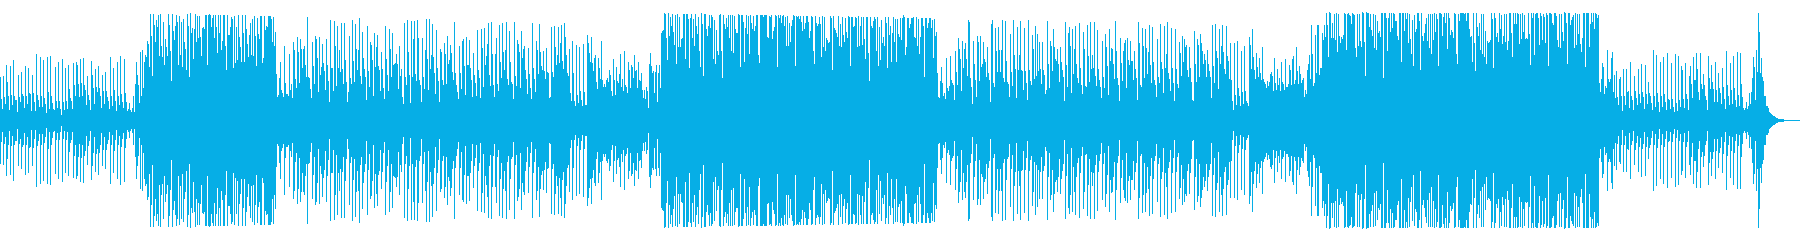 MelancholyChillOutの再生済みの波形